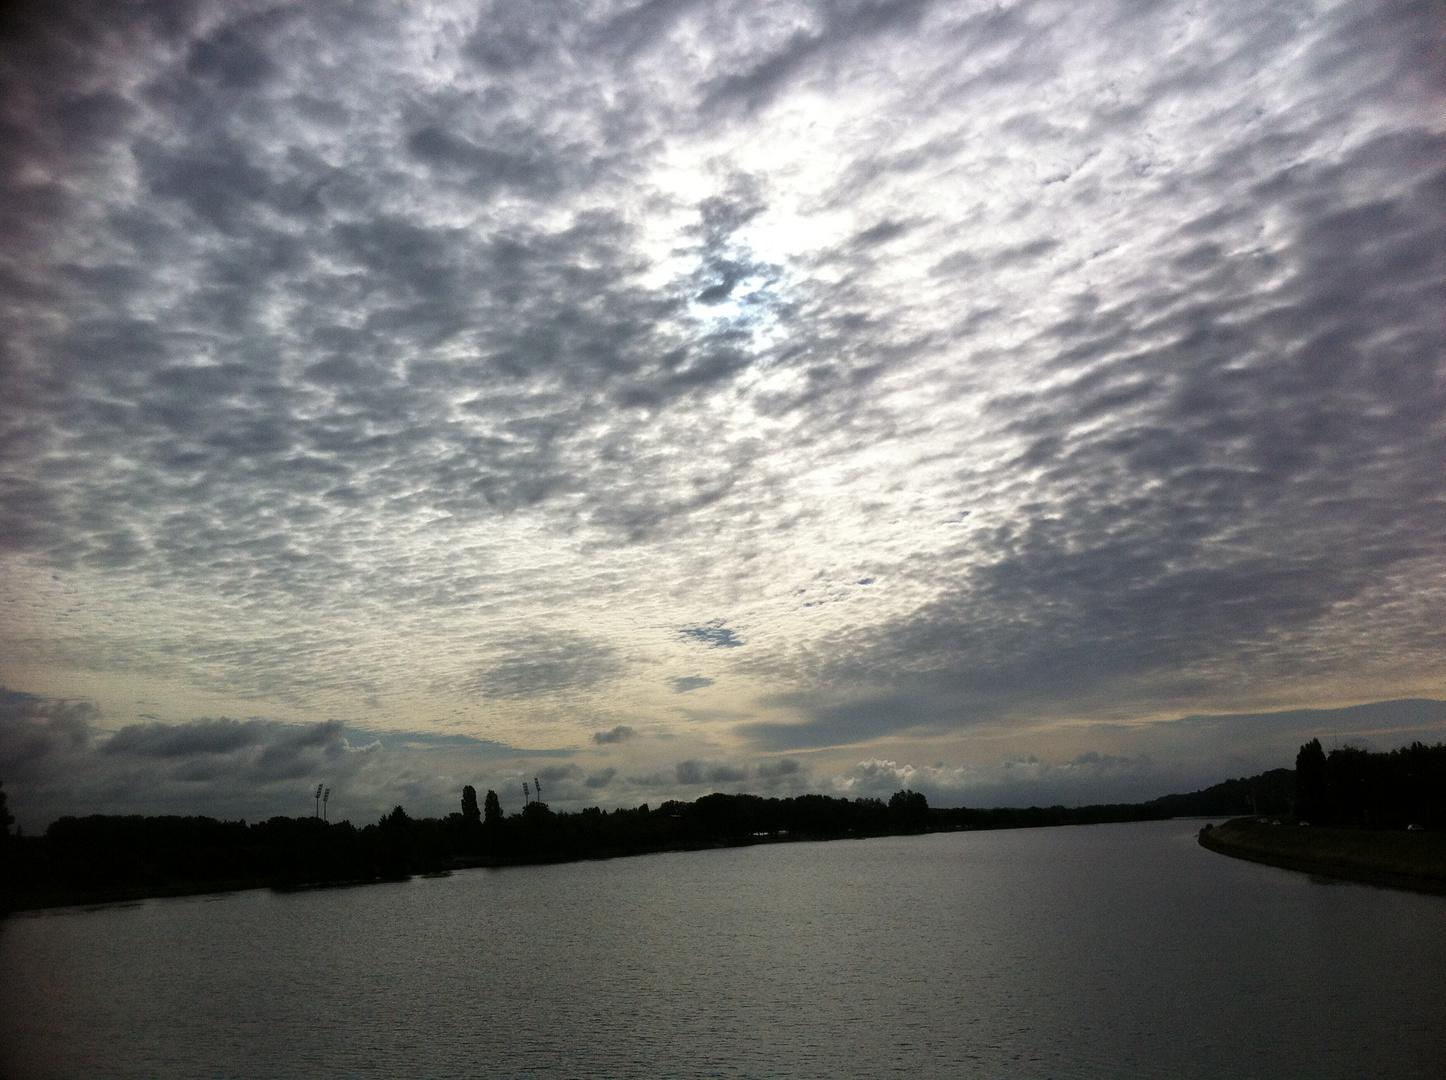 Trajectoire nuageuse